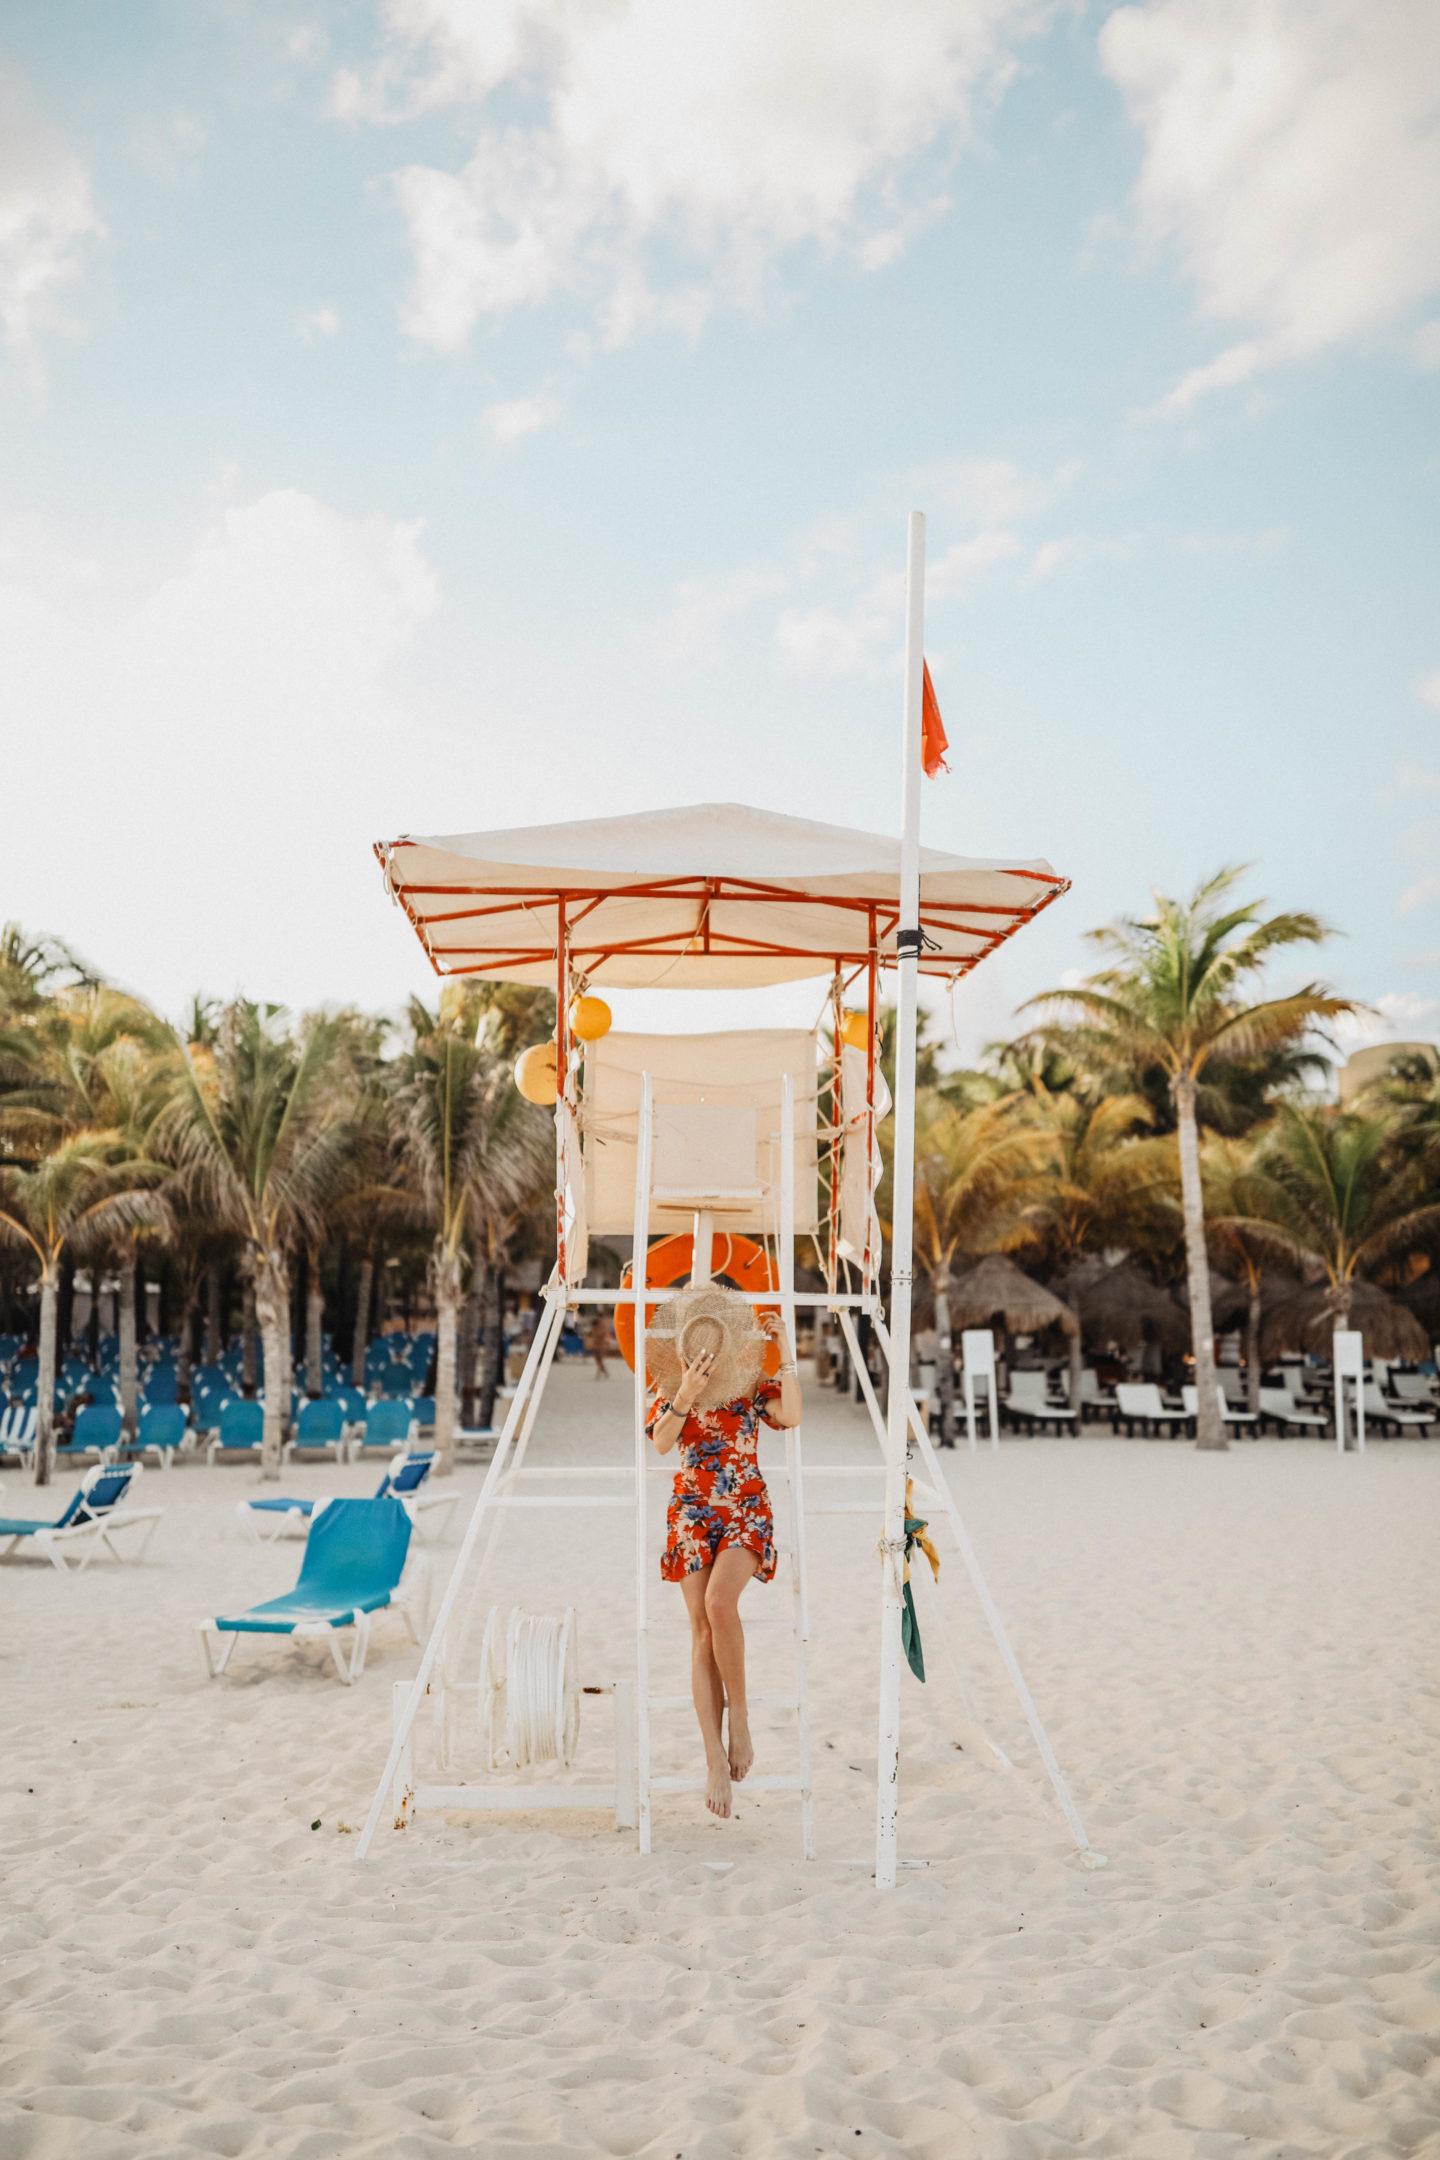 playa del carmen marie and mood voyage au mexique